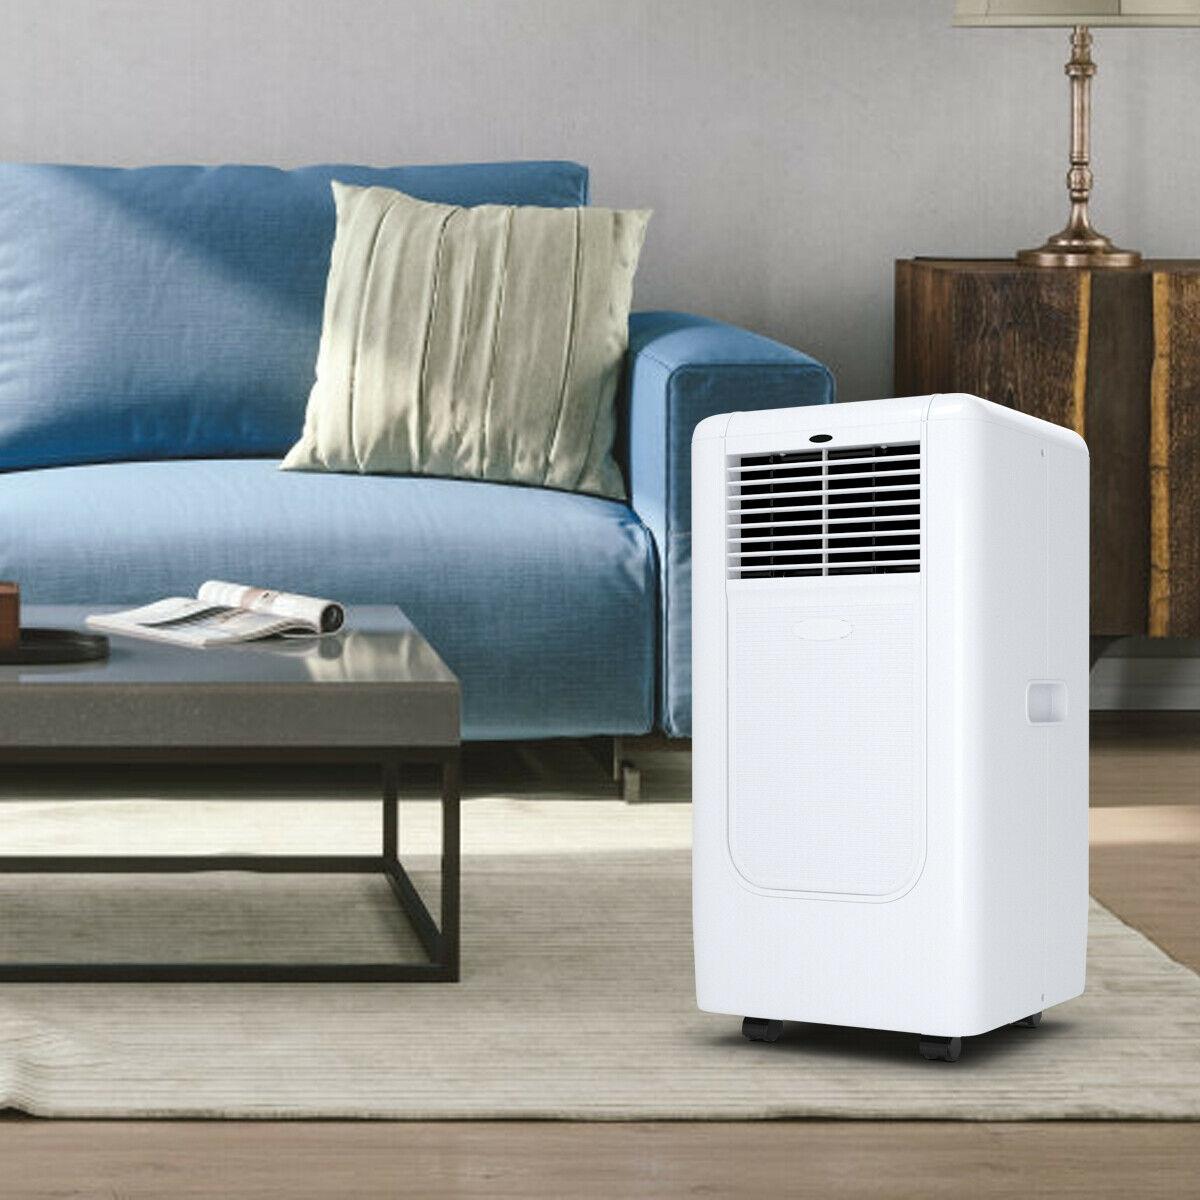 Portable 10000 BTU Air Conditioner Cooling Dehumidify Timer Remote